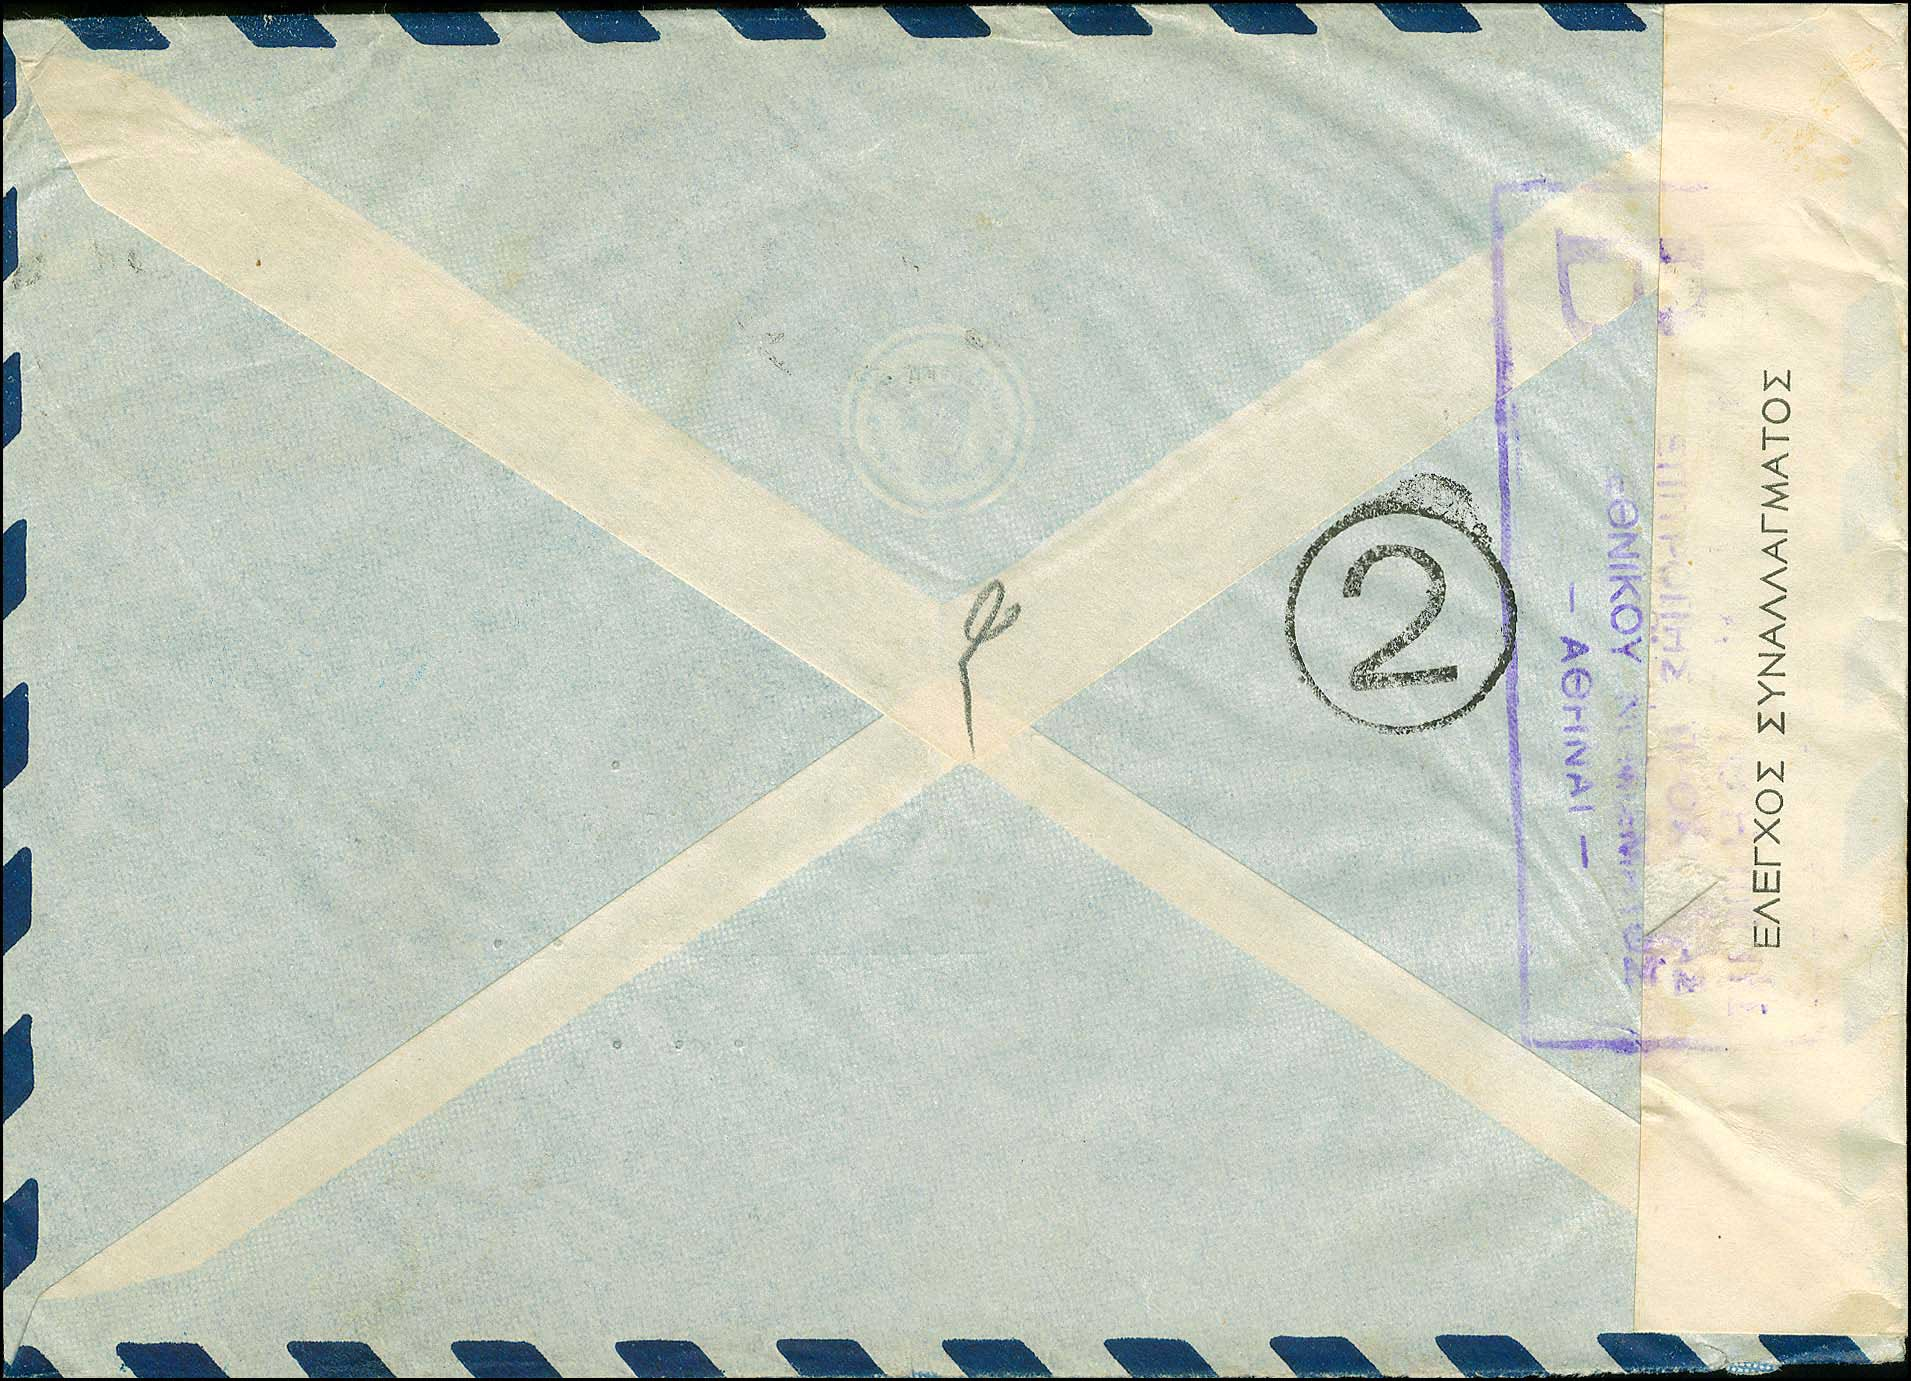 Lot 1153 - GREECE-  POSTMARKS & CANCELLATIONS exchange control cachets -  A. Karamitsos